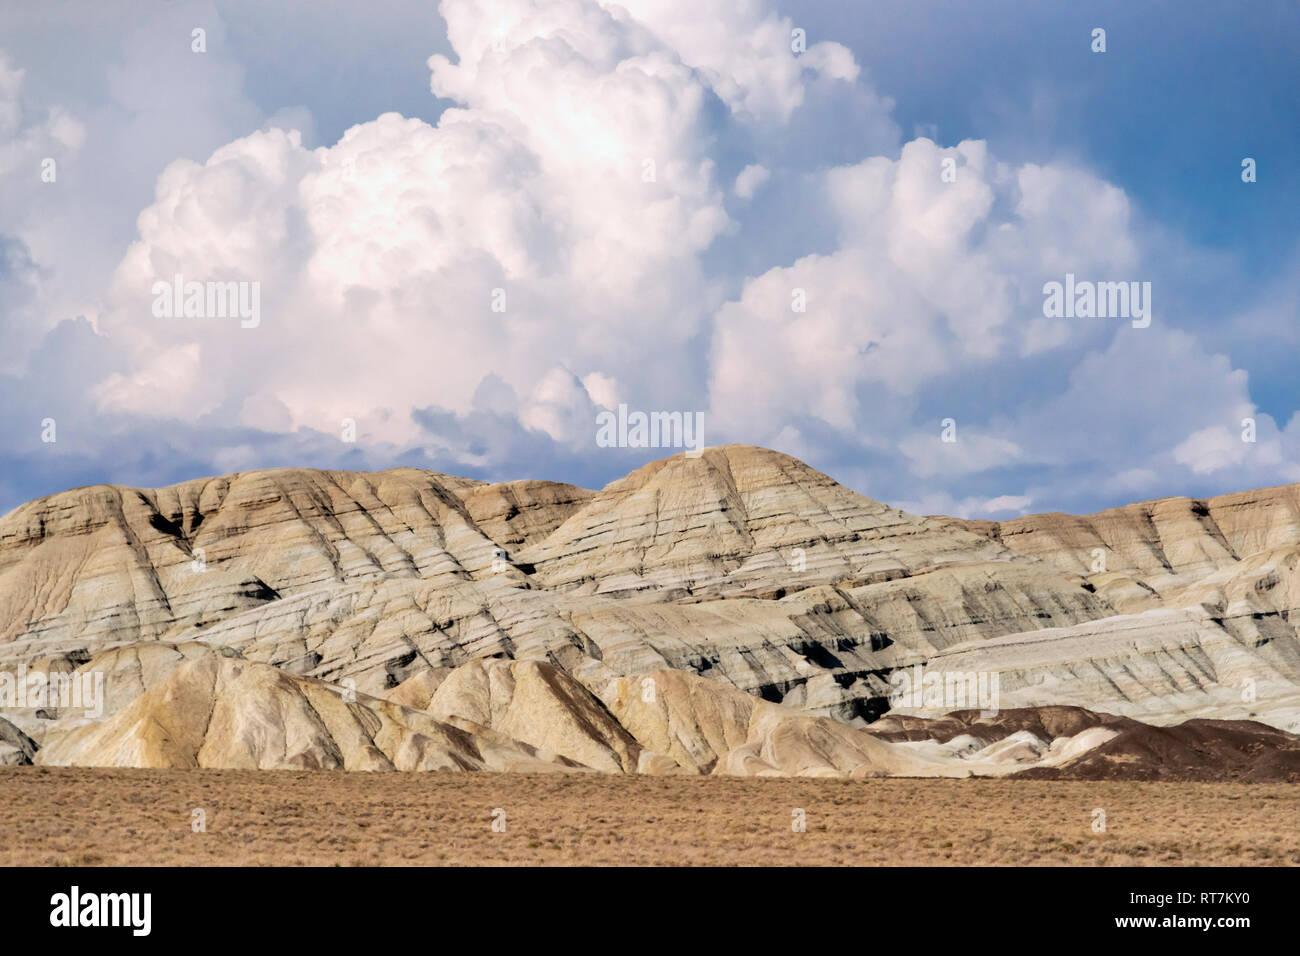 Gypsum cliffs, Aktau Mountains, Altyn Emel National Park, Kazakhstan - Stock Image